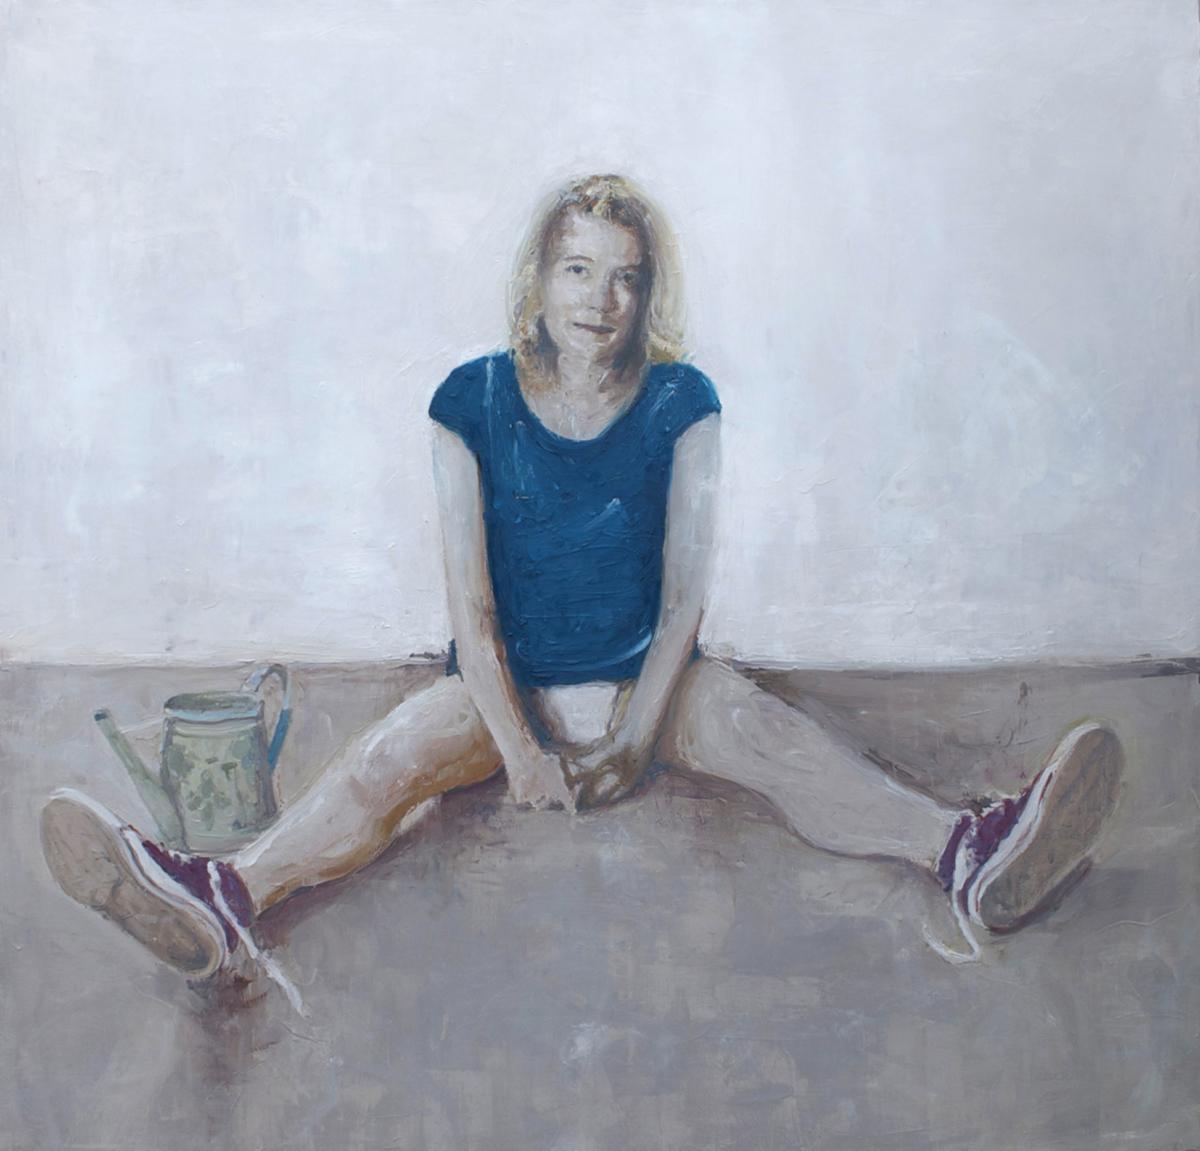 Martine, 2011 Huile sur toile, 120 x 120 cm ©Vincent Ruffin